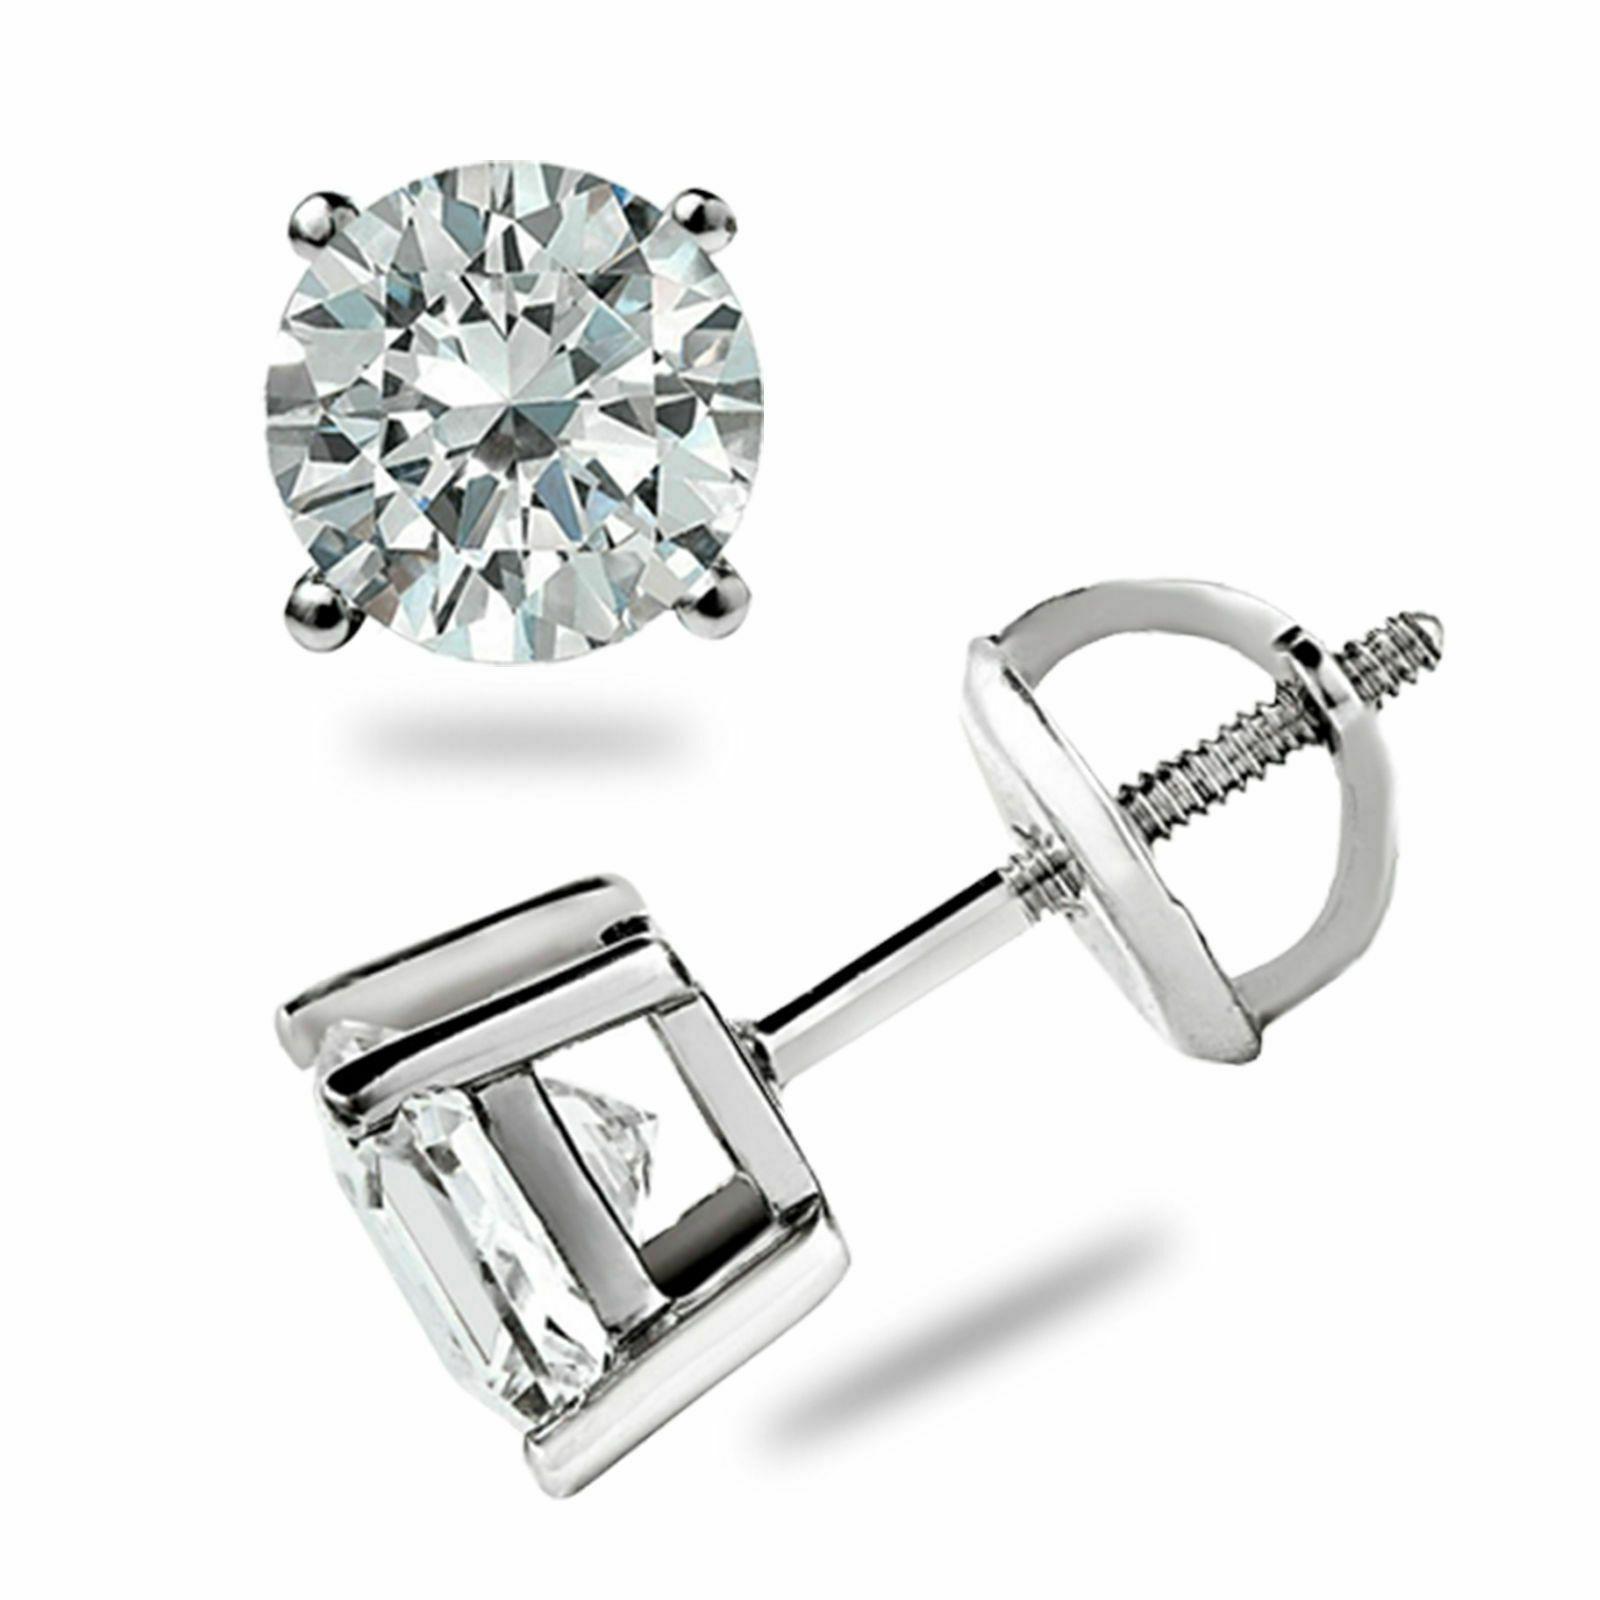 1.11 CT Rodada Lad Diamond Engagement Brincos 14k Branco banhado a ouro brinco para ela